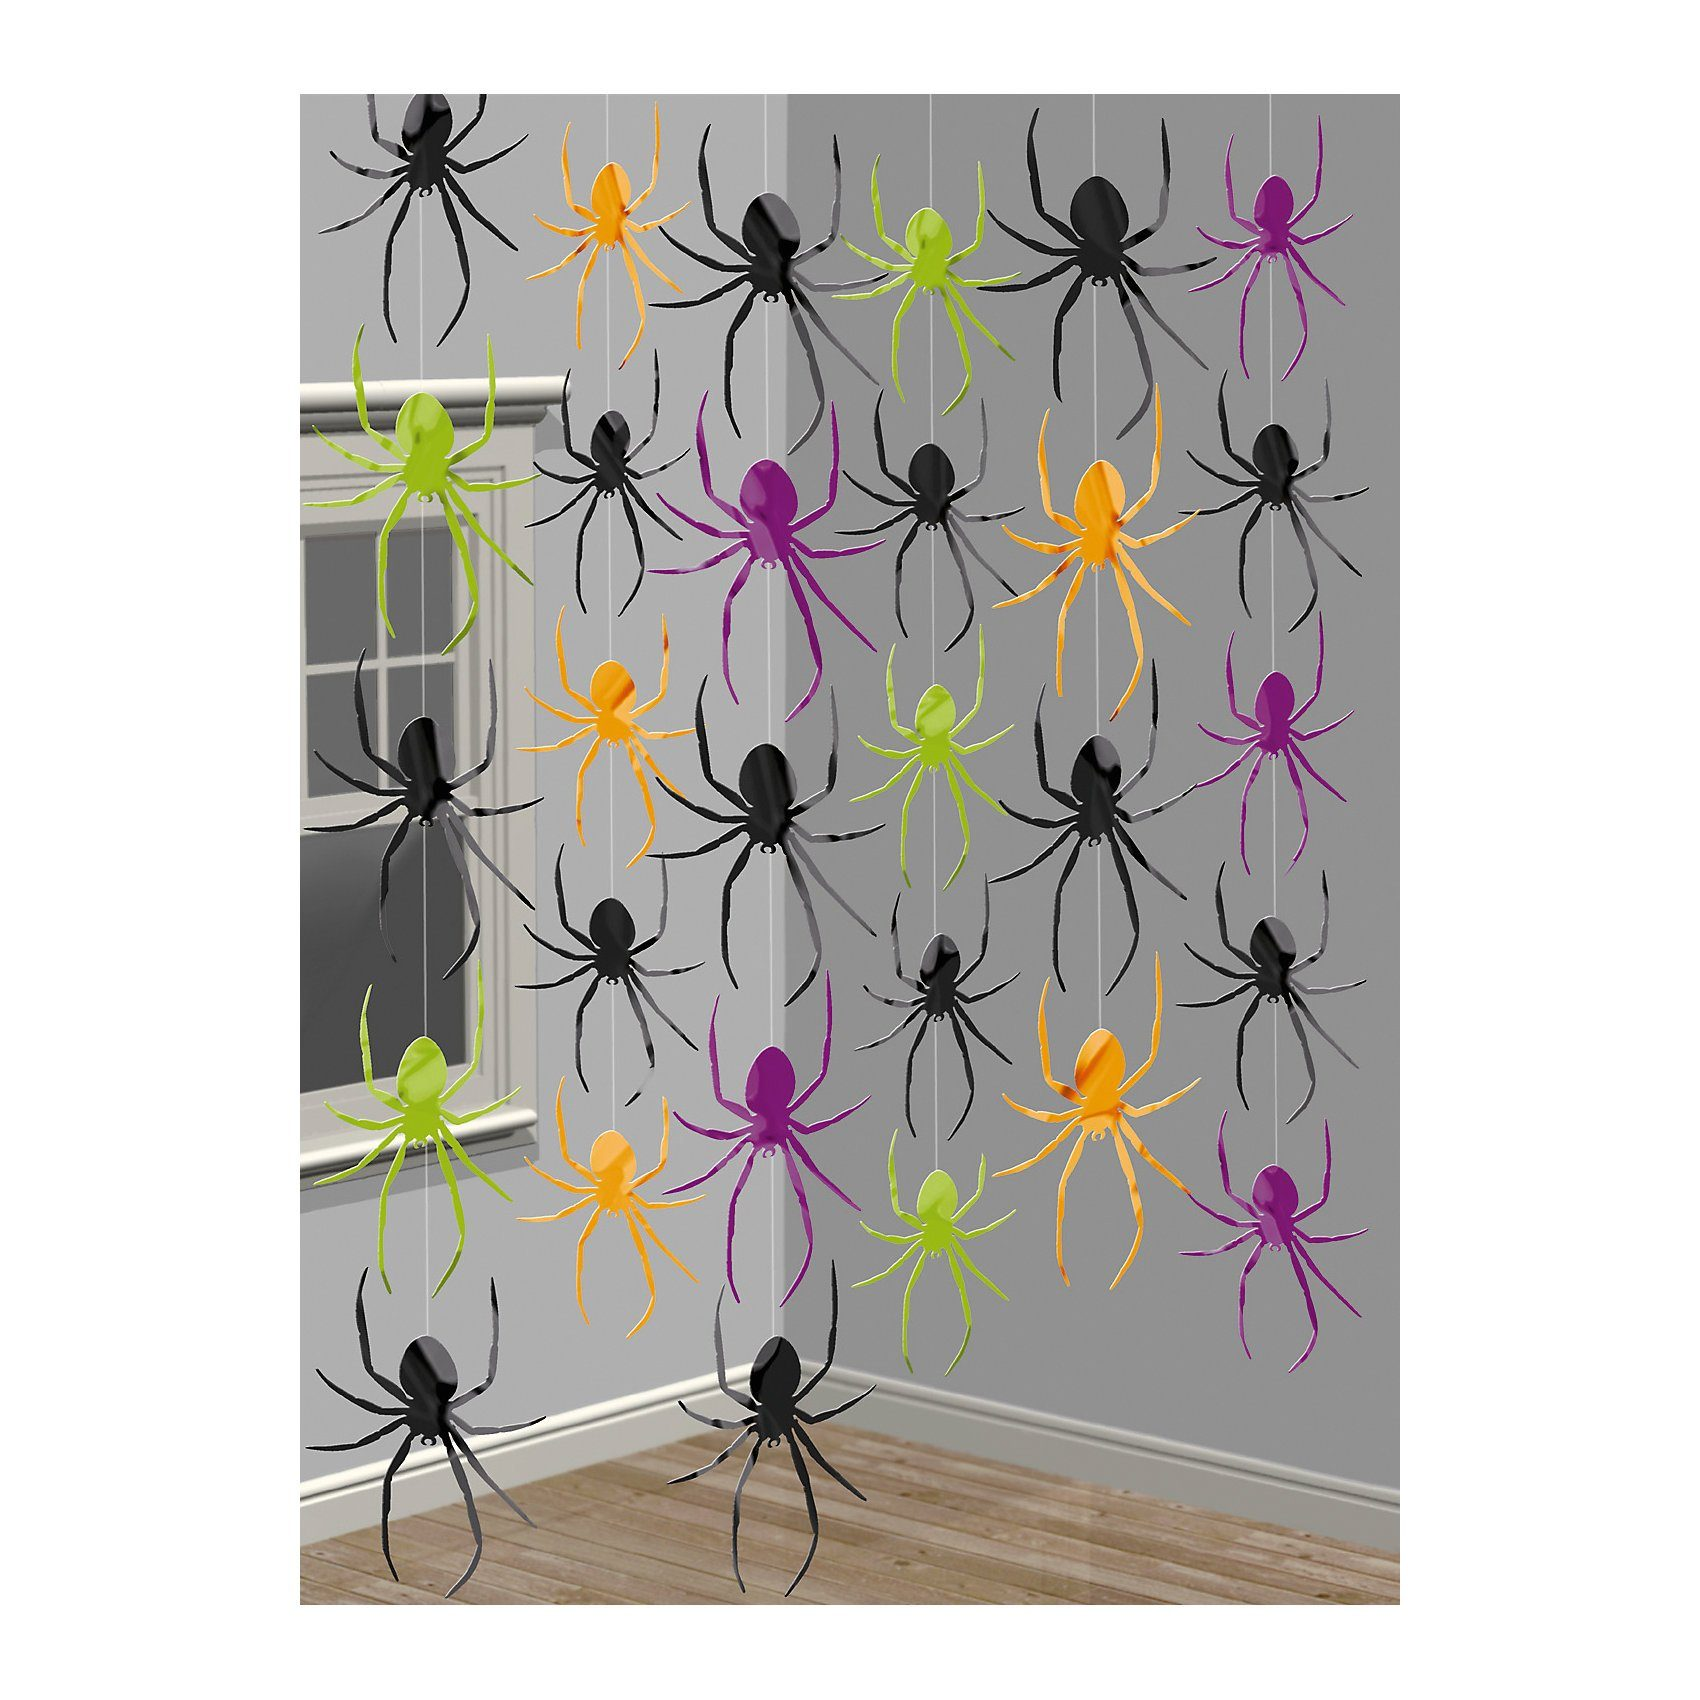 Amscan Hängedeko Spinnen Halloween Classic, 2,1 m, 6 Stück